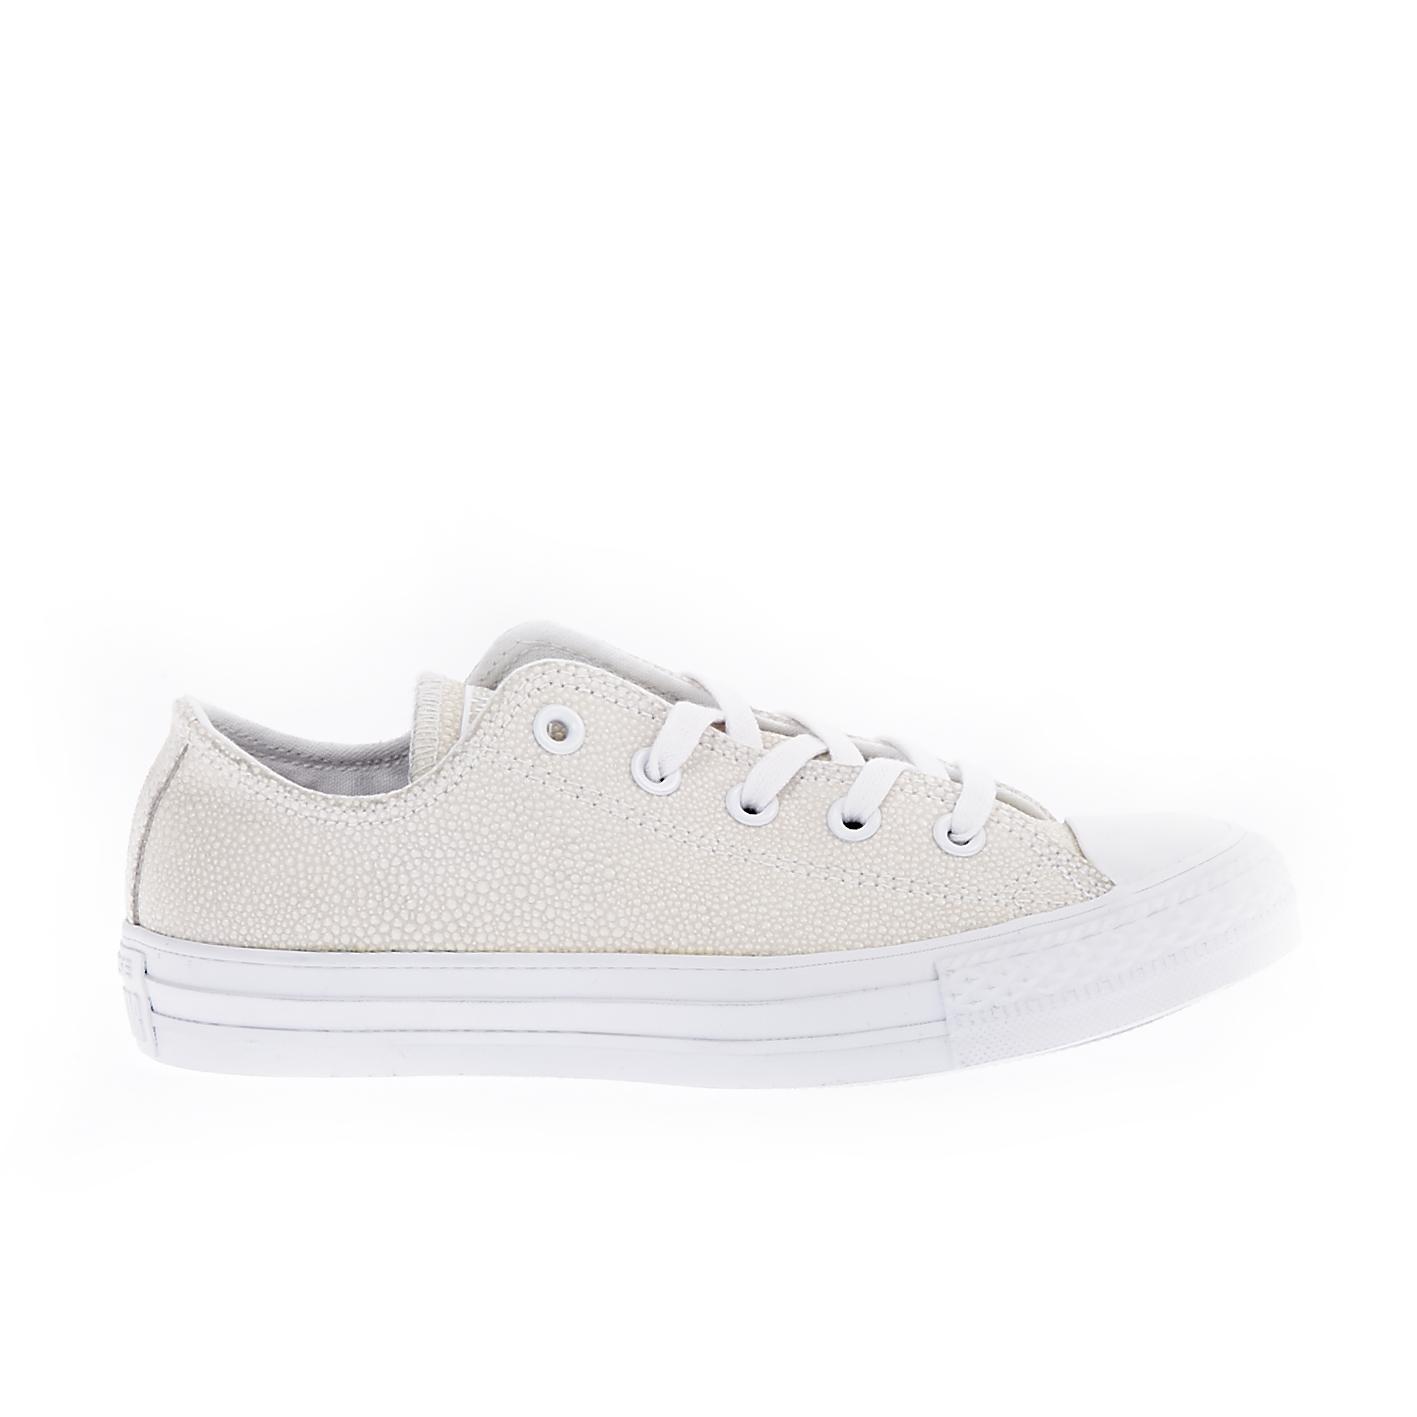 CONVERSE – Γυναικεία παπούτσια Chuck Taylor All Star Ox μπεζ